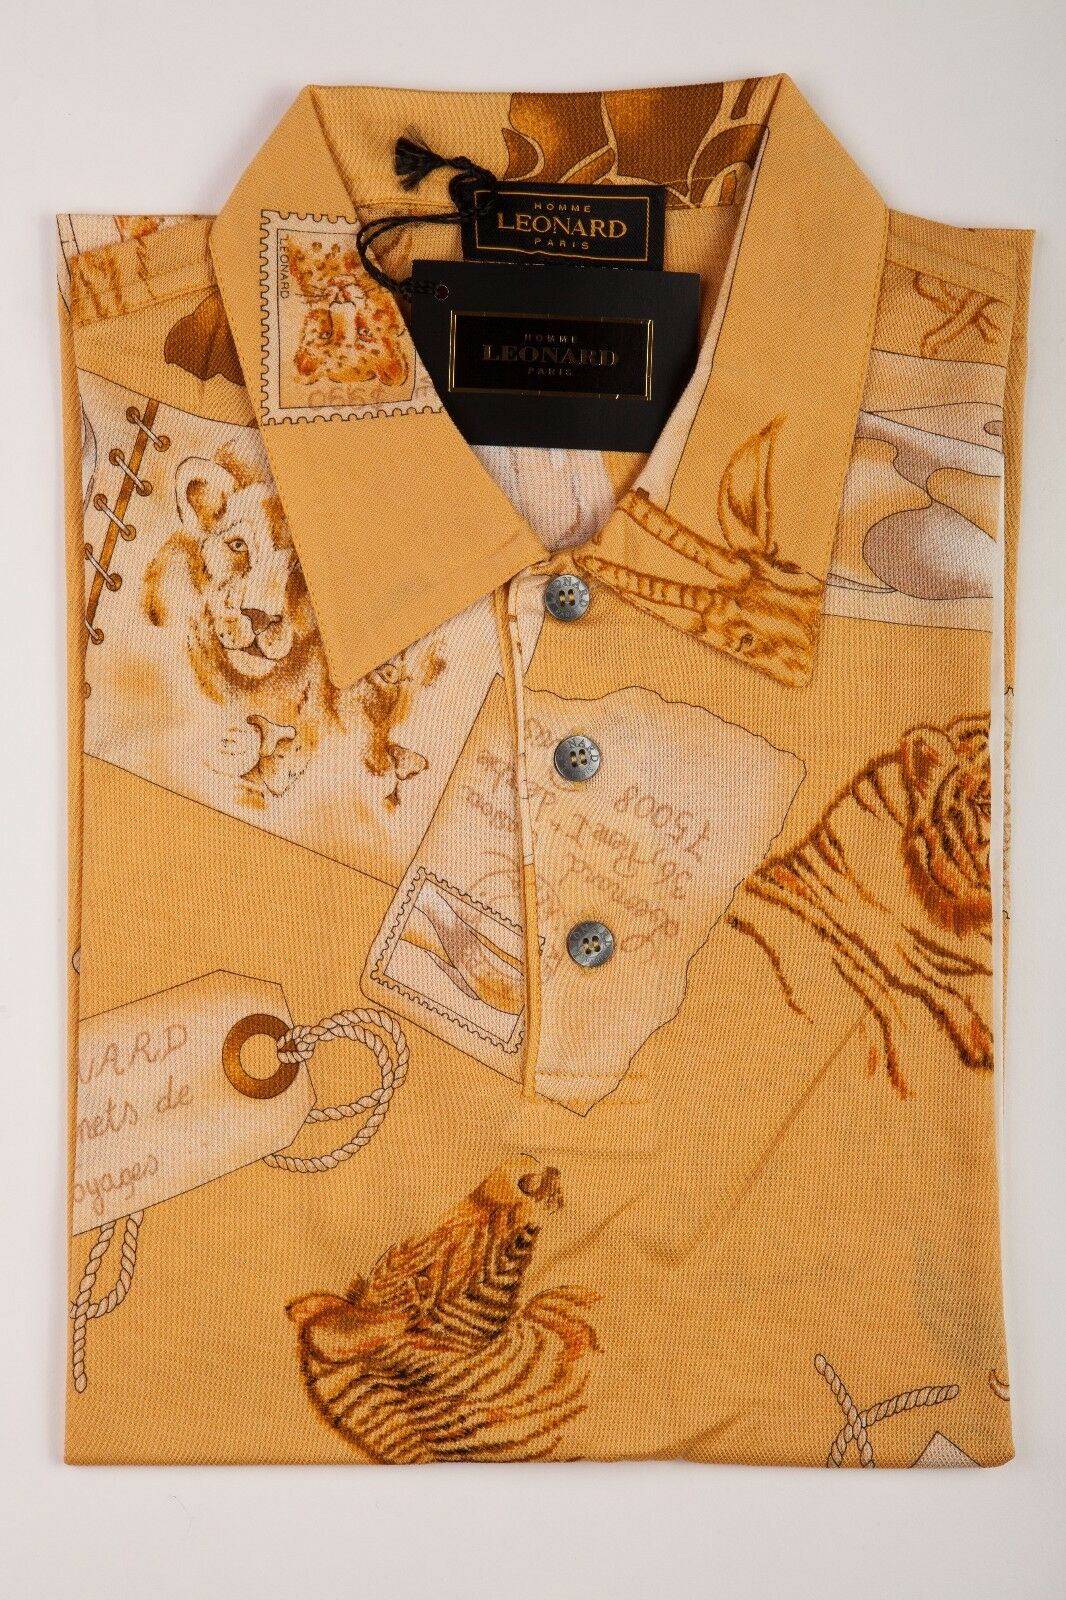 NEW 360  Luxury LEONARD PARIS Polo Shirt Cotton Men Size S  SAFARI   2